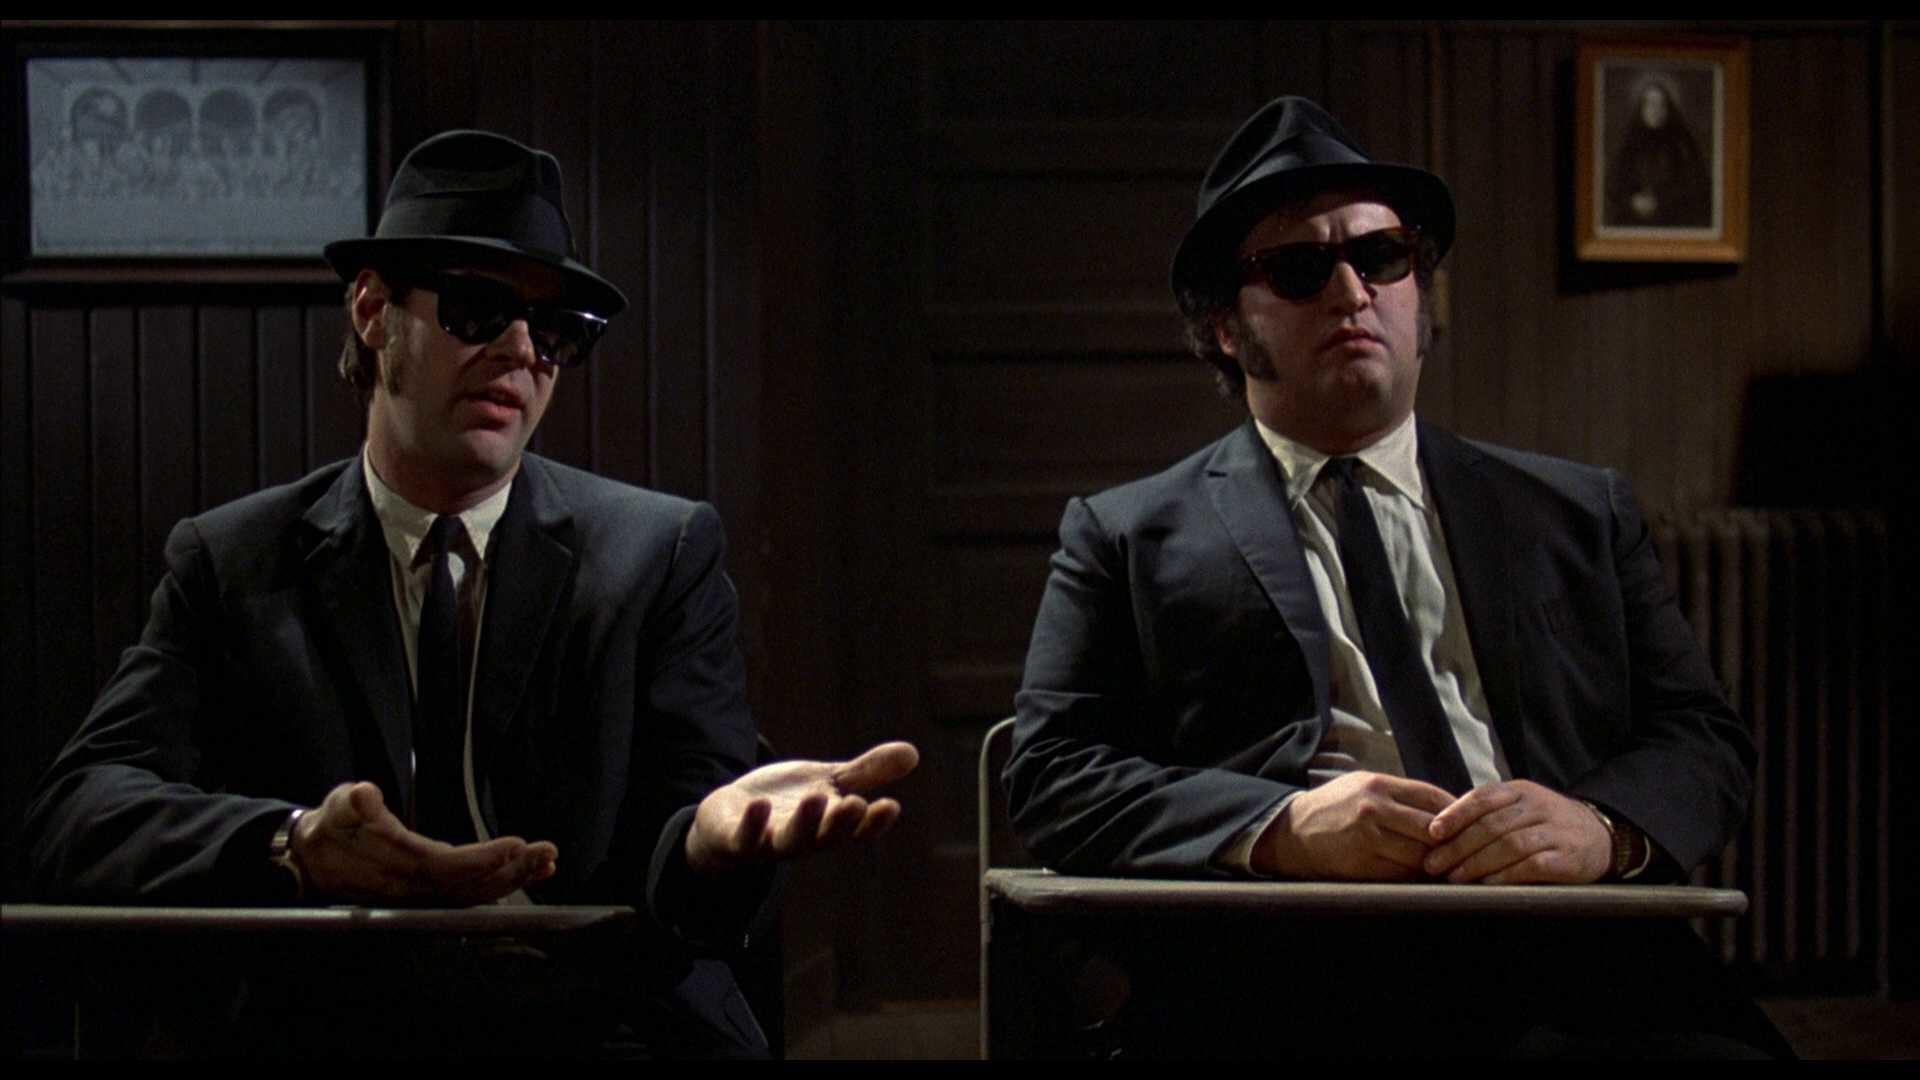 1920x1080 The Blues Brothers 2 Download Highdefdiscnews Screenshots 12